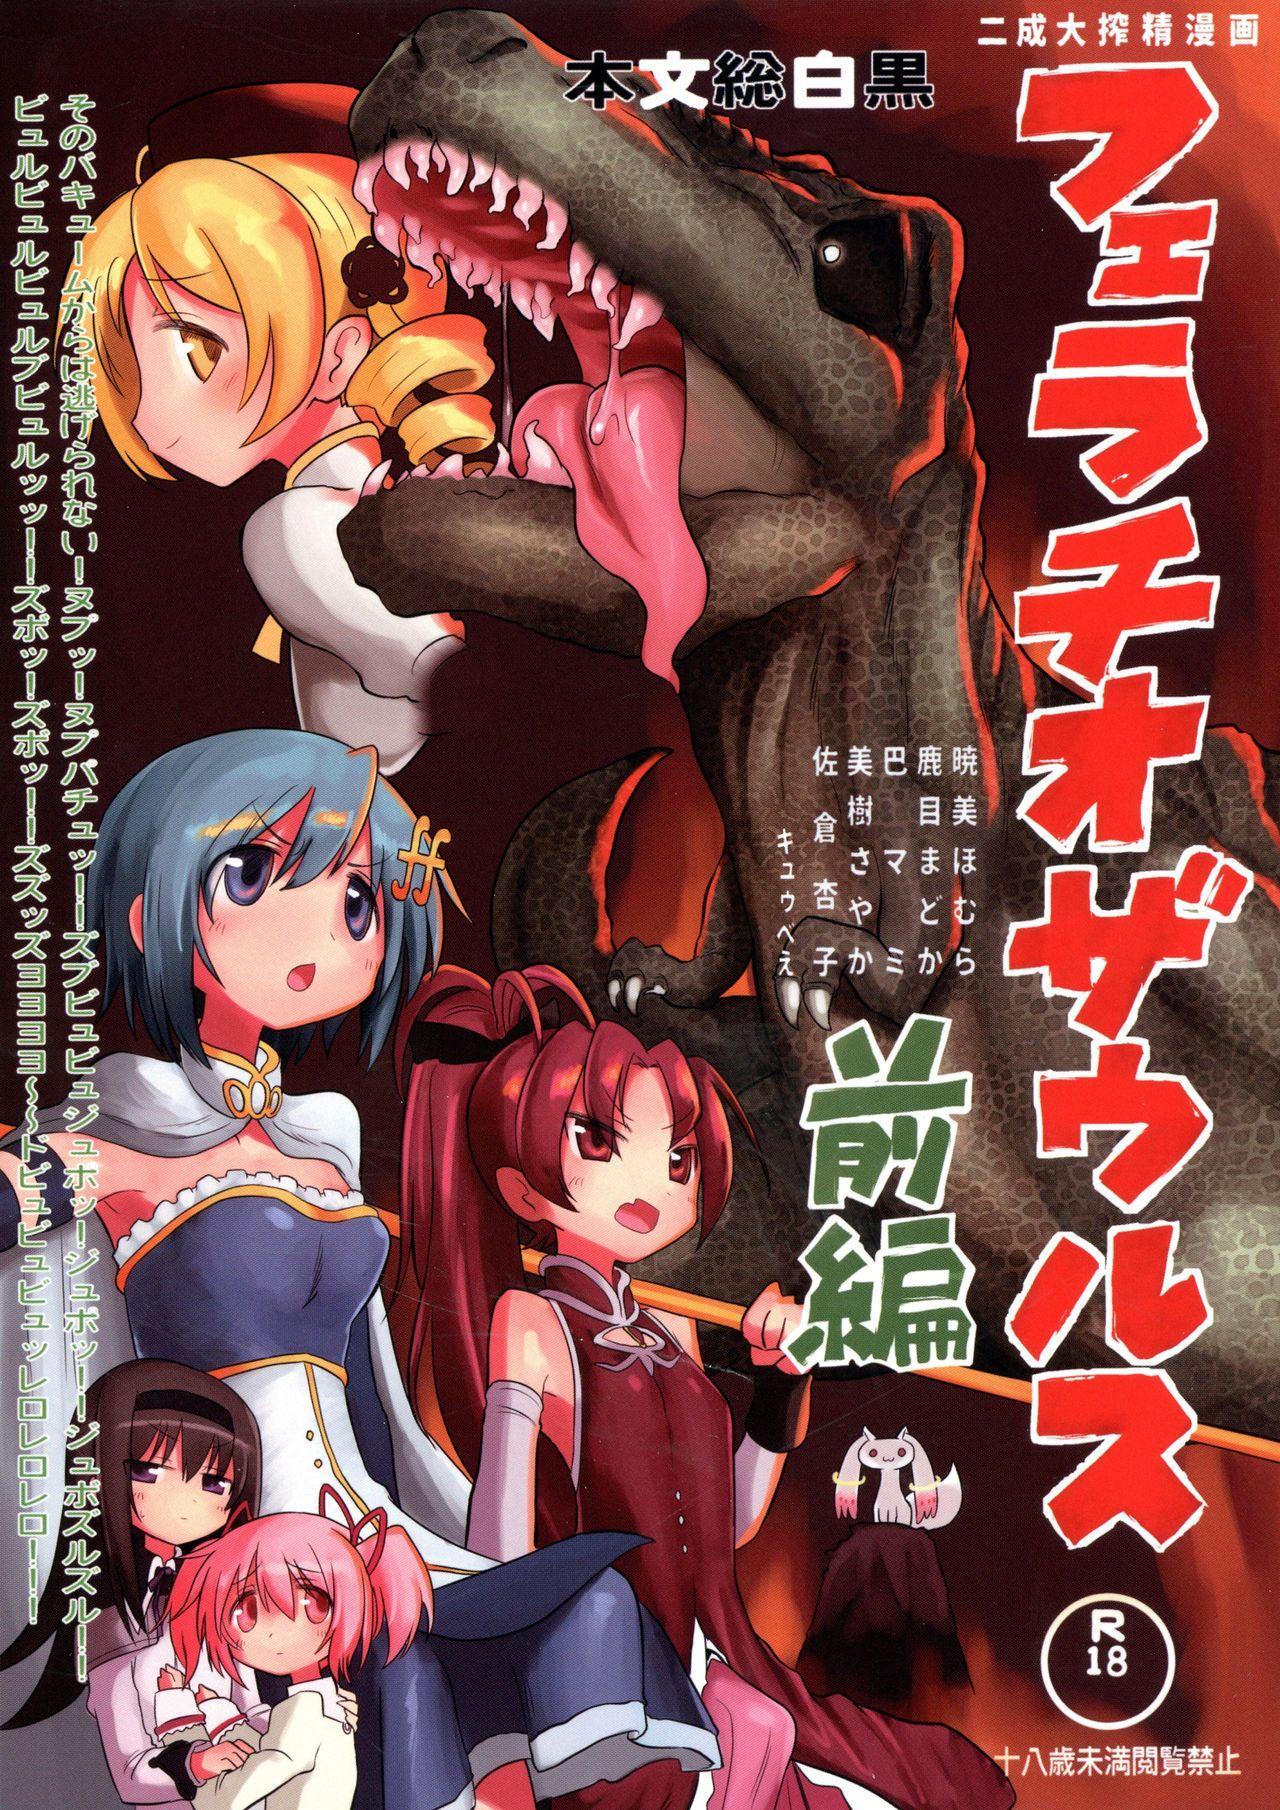 Fellatiosaurus VS Mahou Shoujo Zenpen 0